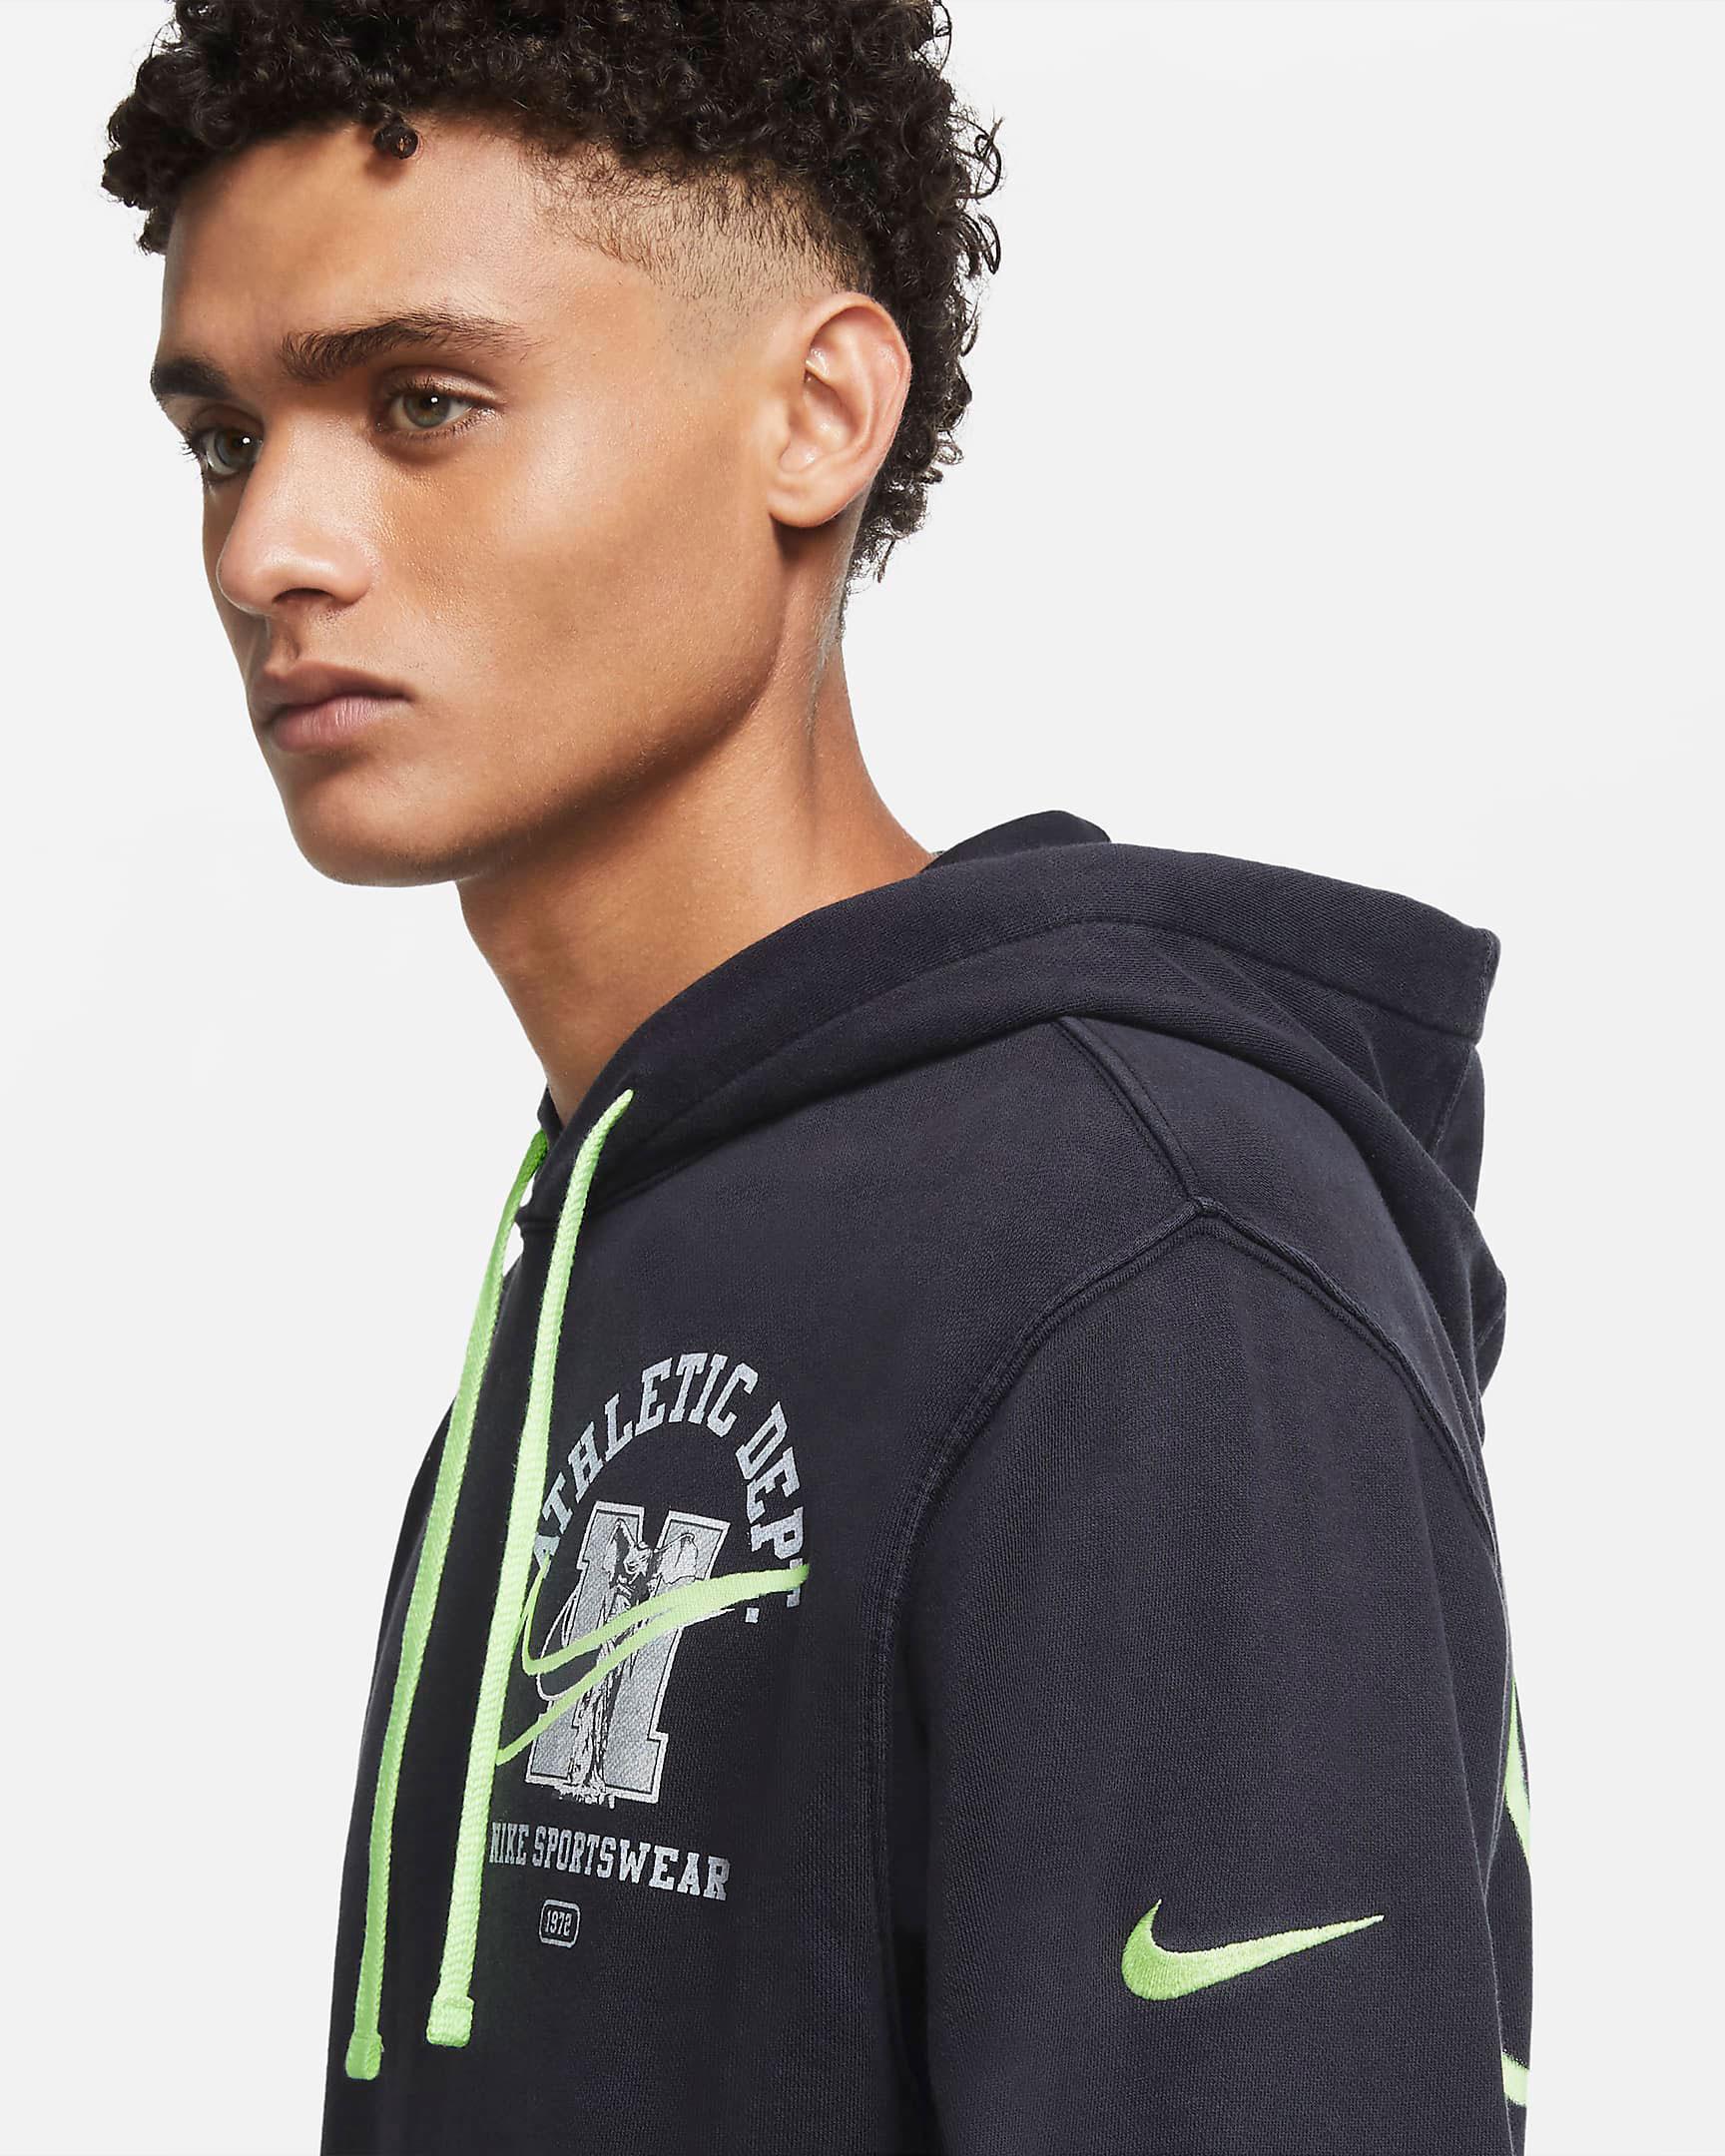 nike-club-fleece-class-of-72-hoodie-black-volt-4